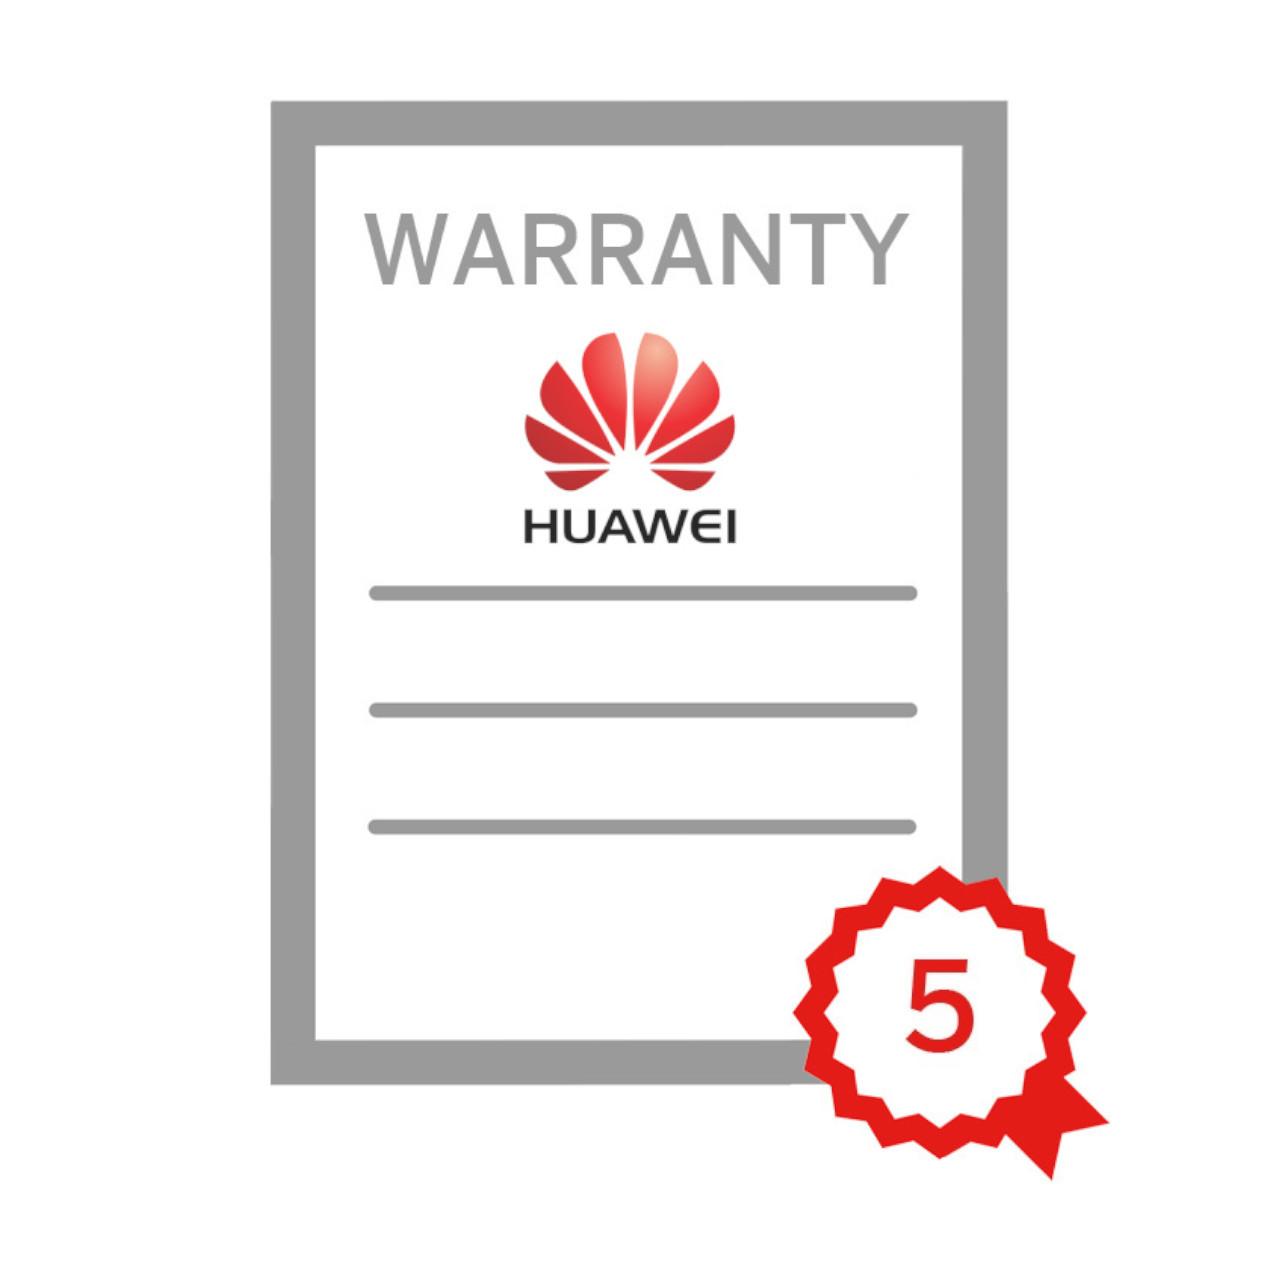 Huawei - 33KTL Warranty Extension plus 5yrs (max 20yrs total)